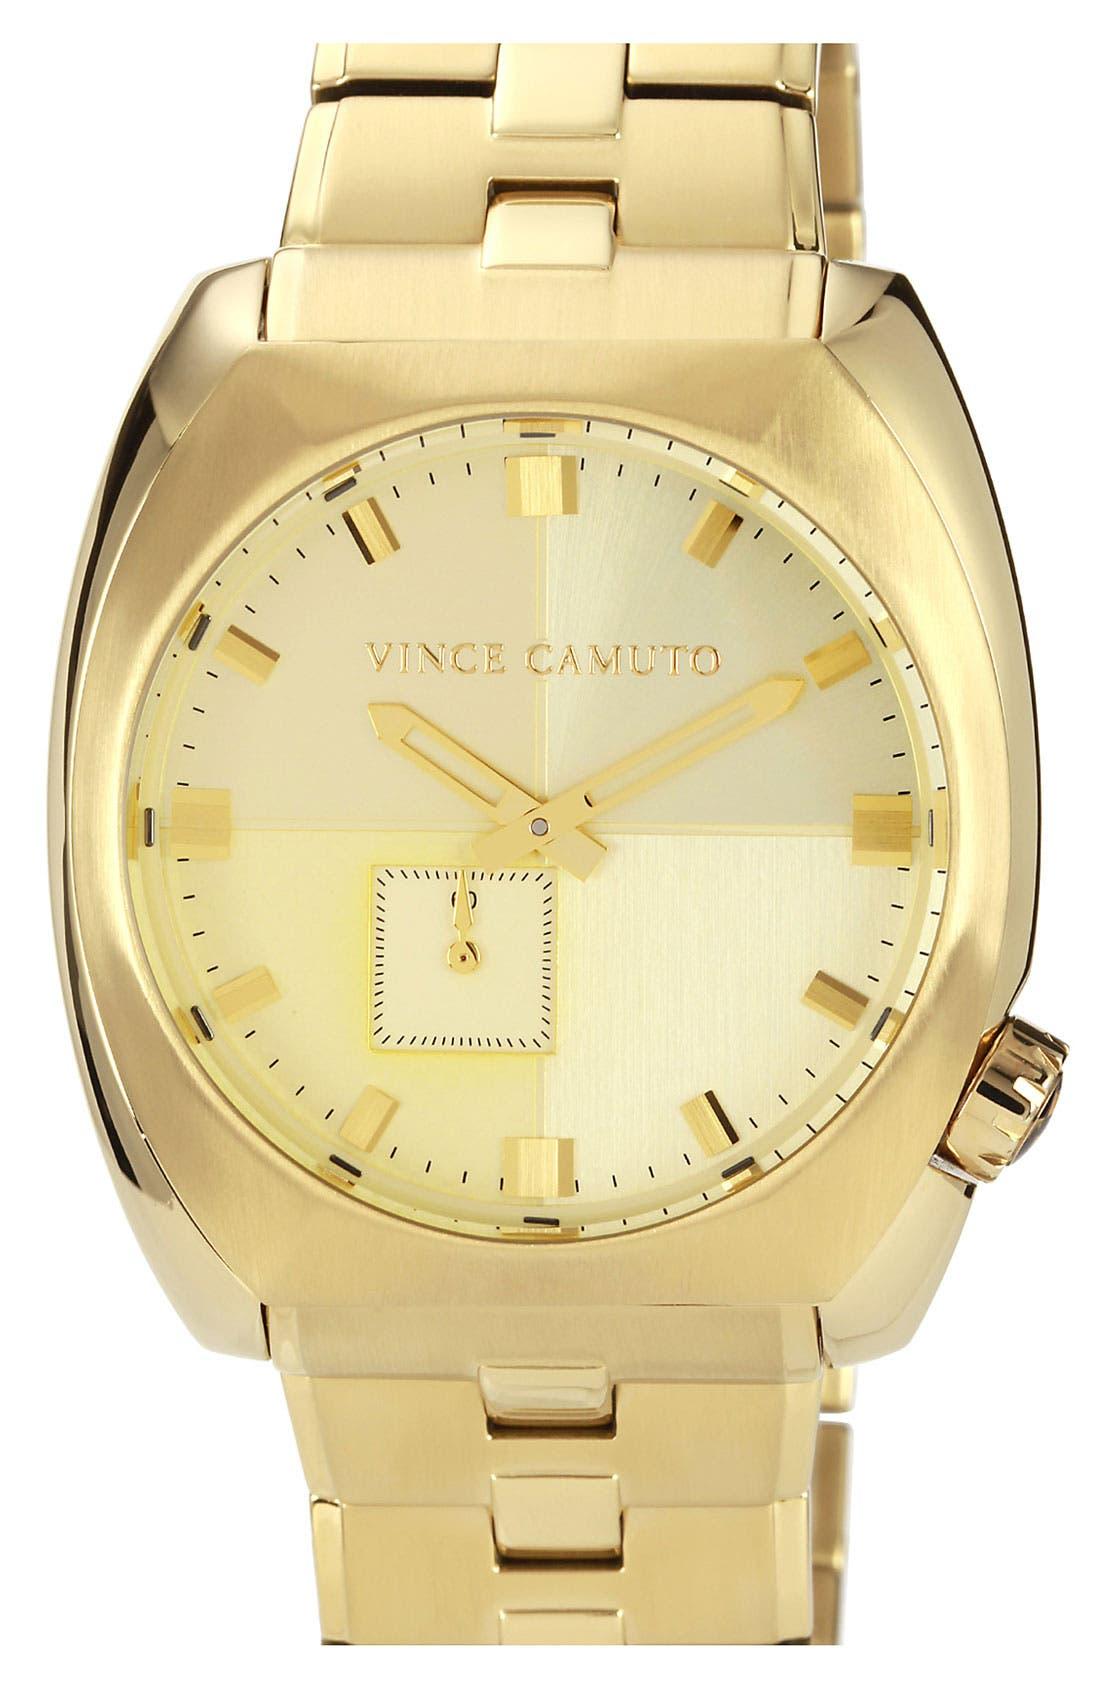 Main Image - Vince Camuto 'Cadet' Bracelet Watch, 43mm x 48mm